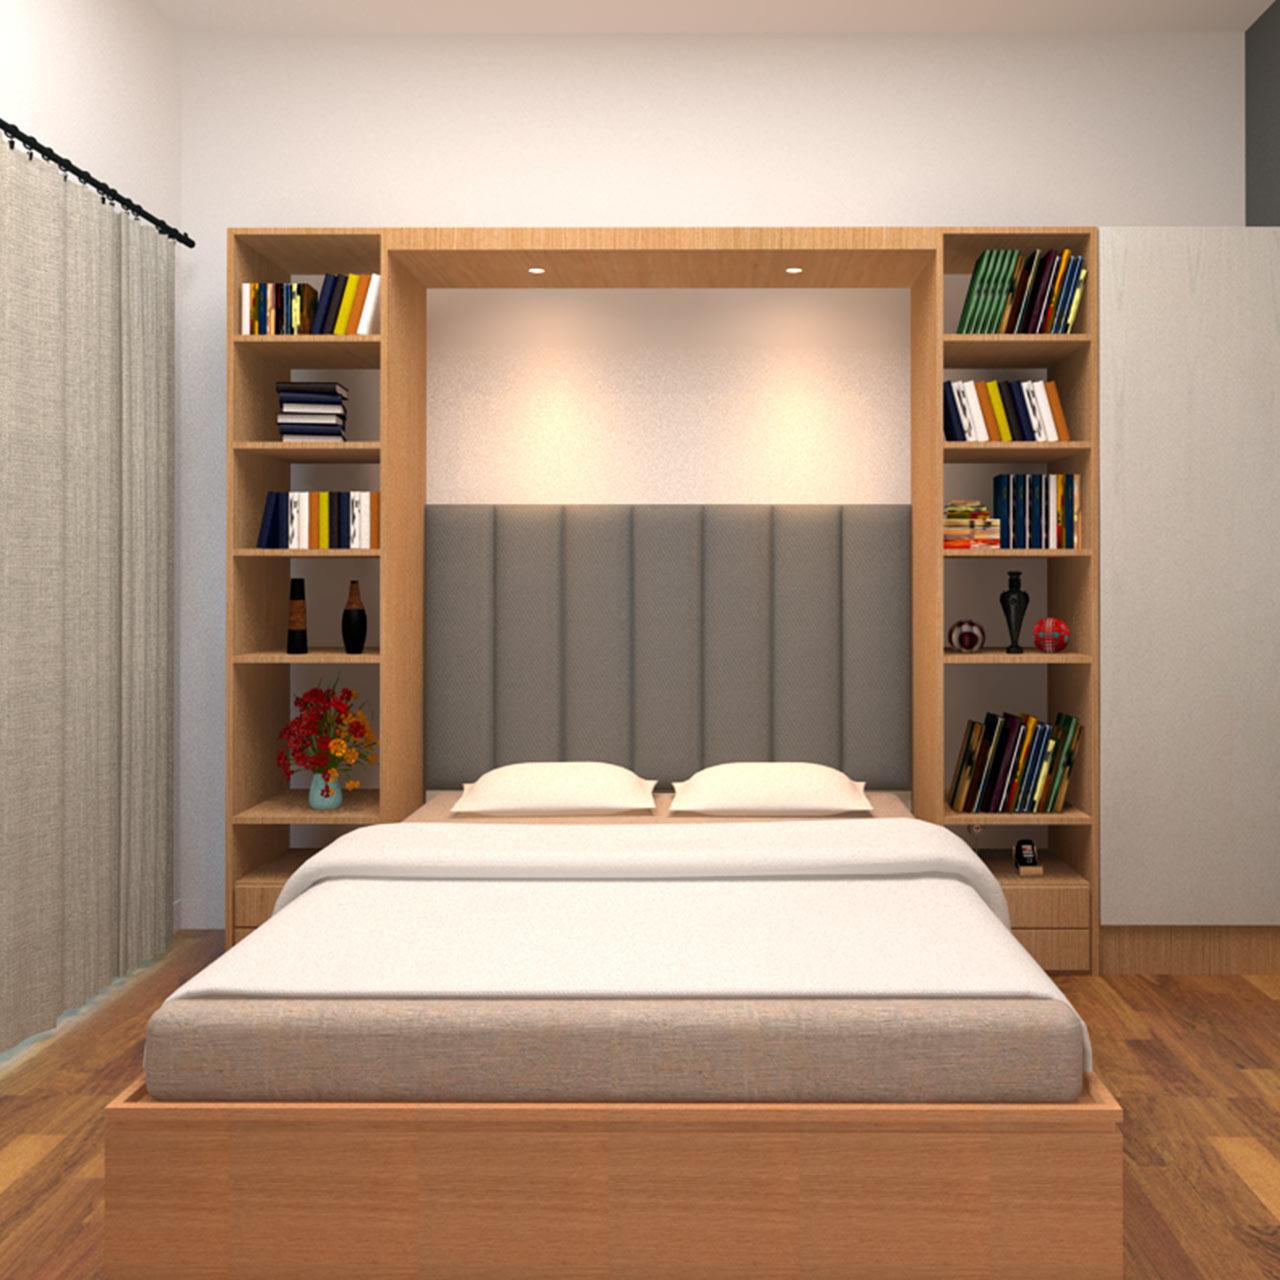 Bedroom Interior Design Checklist | Guides | Design Cafe